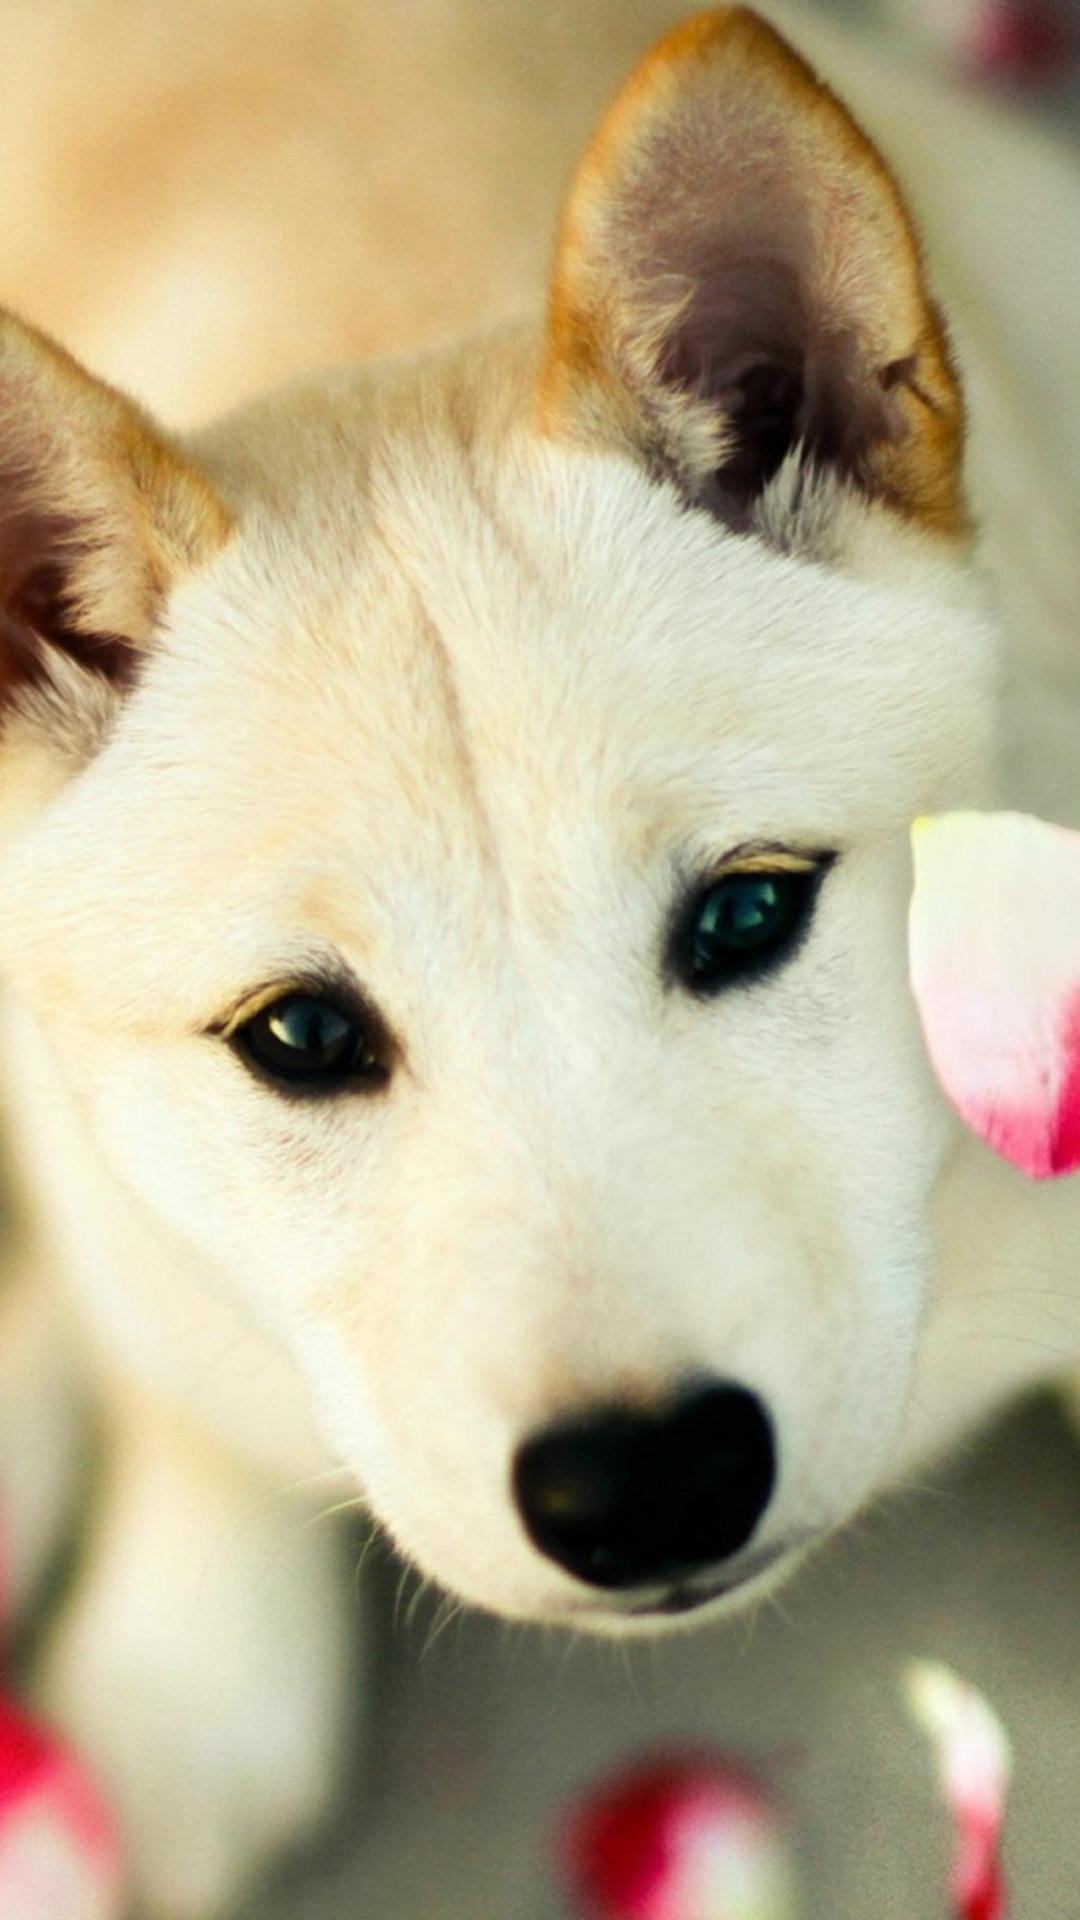 Cute Wallpapers Of Dog 1080x1920 Download Hd Wallpaper Wallpapertip